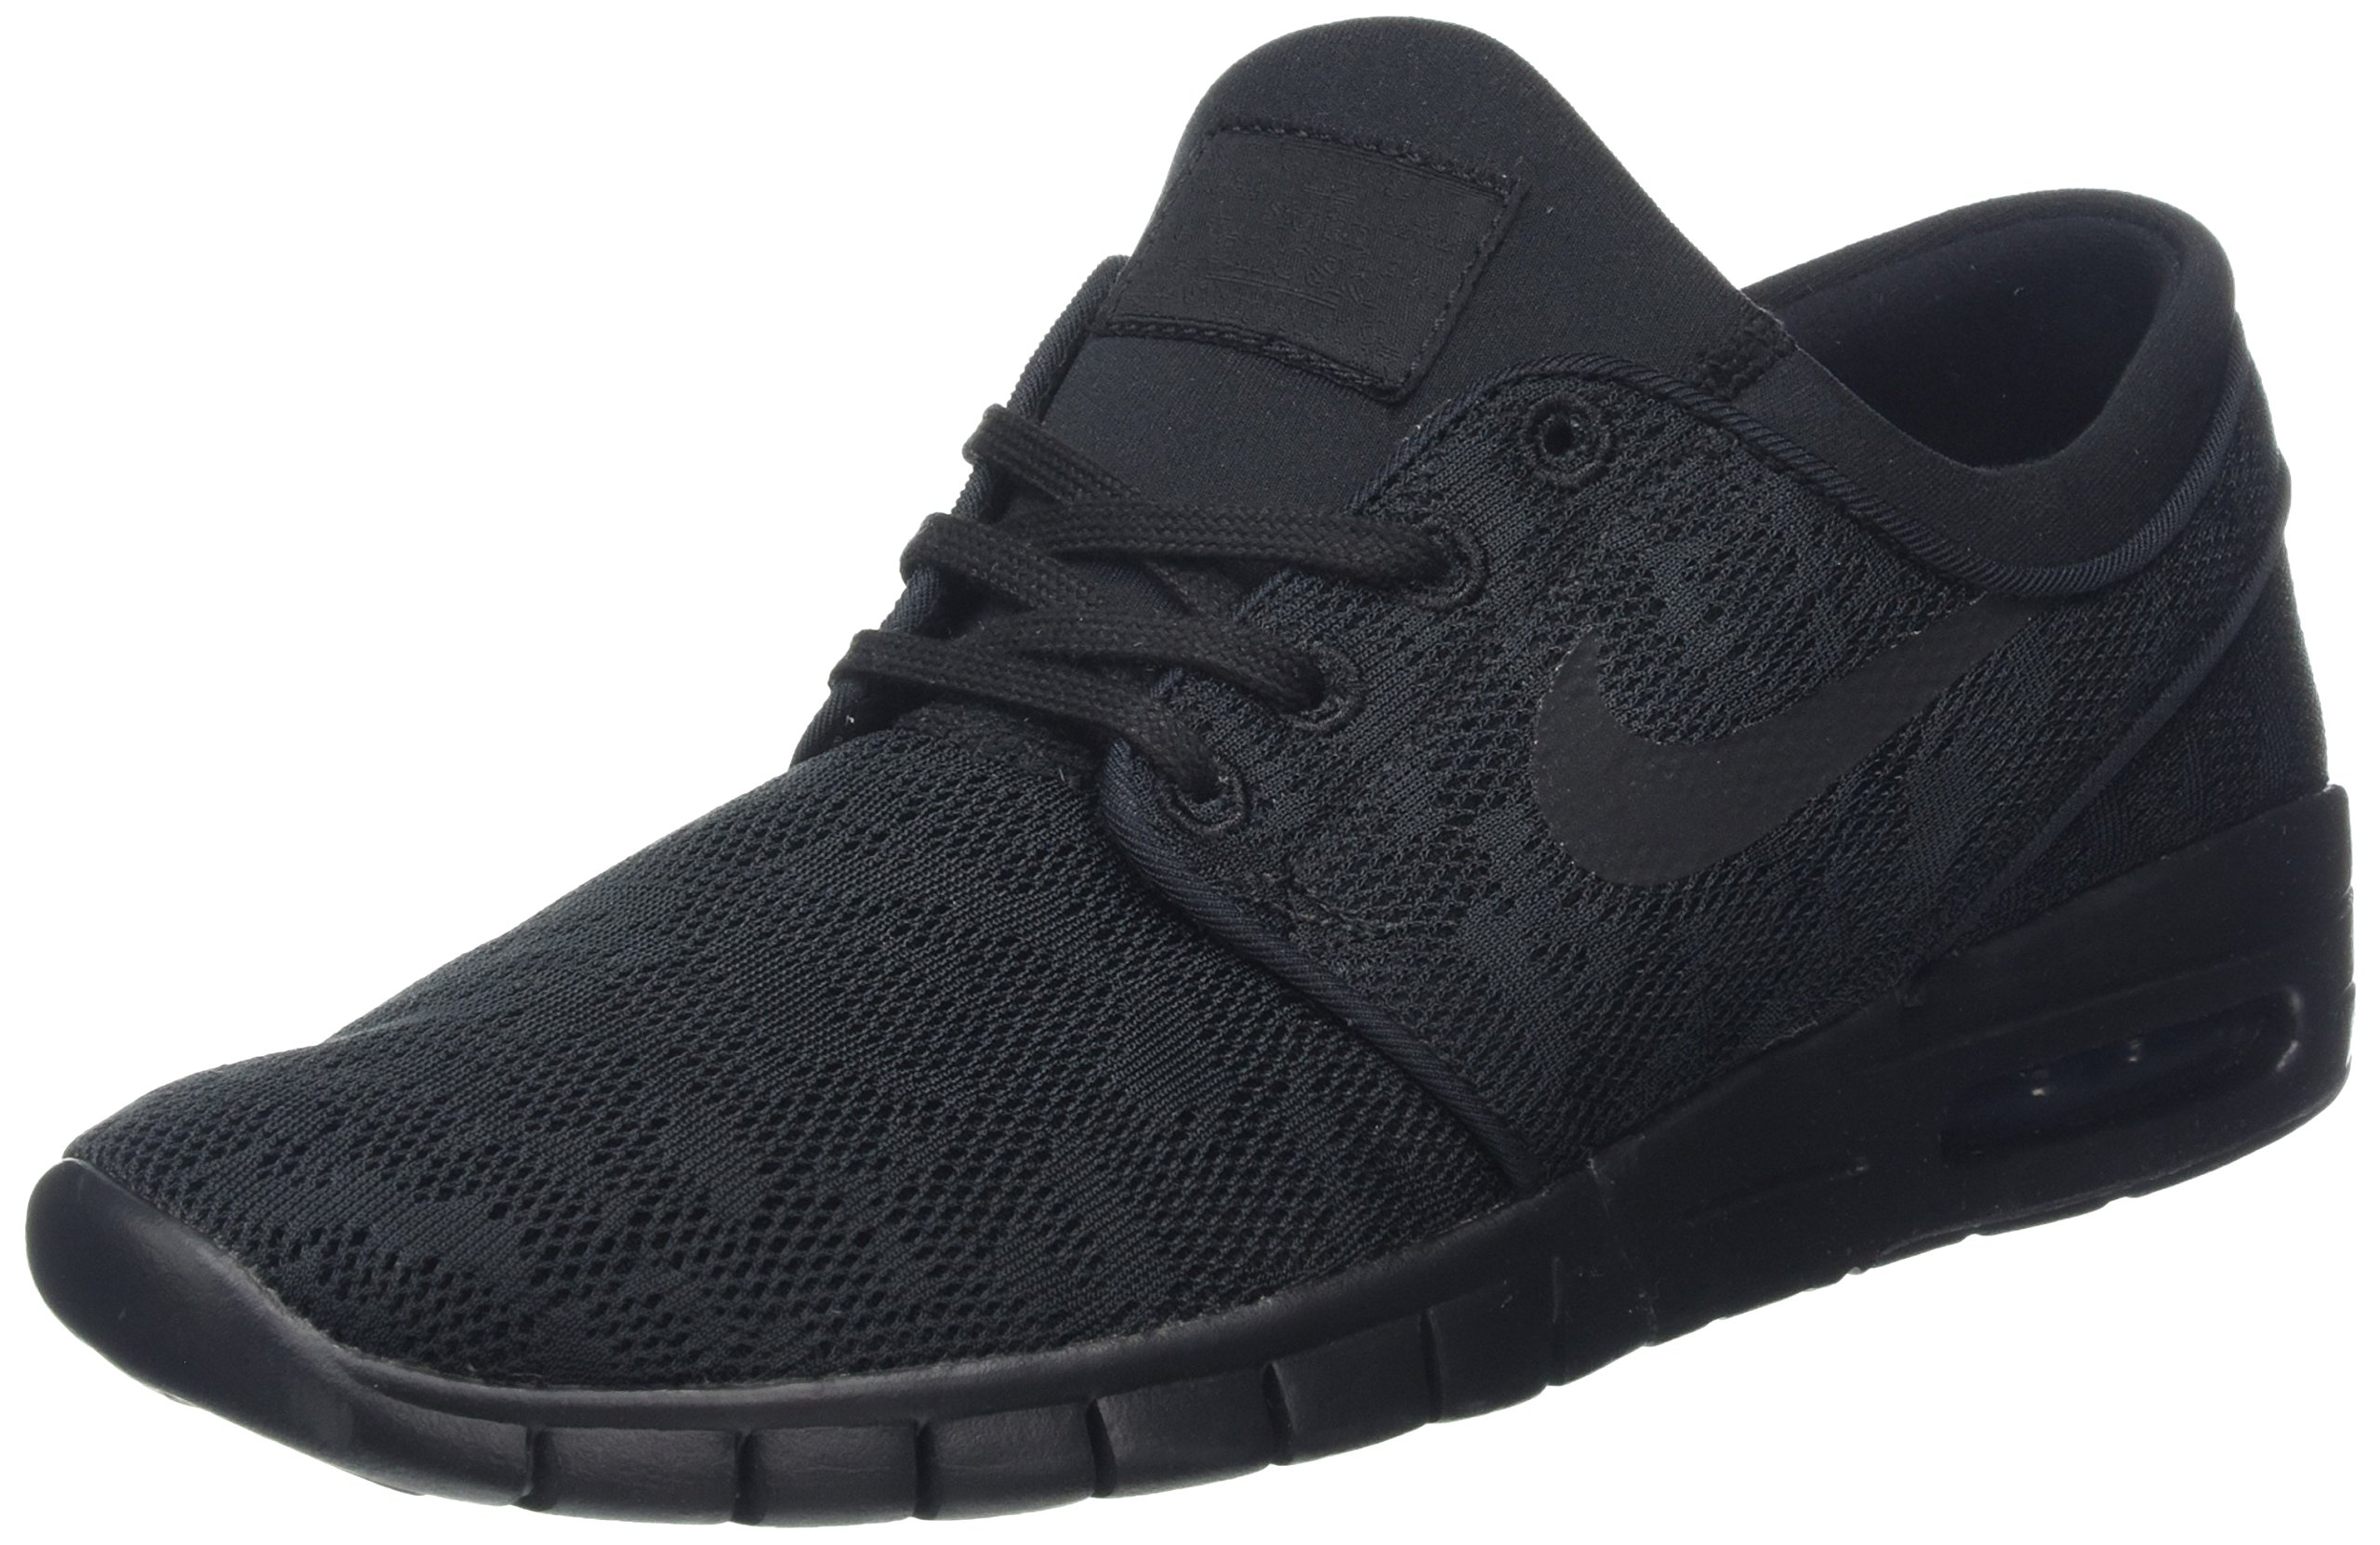 Nike Men's Stefan Janoski Max Black/Black-anthraciteSneakers - 9.5 D(M) US